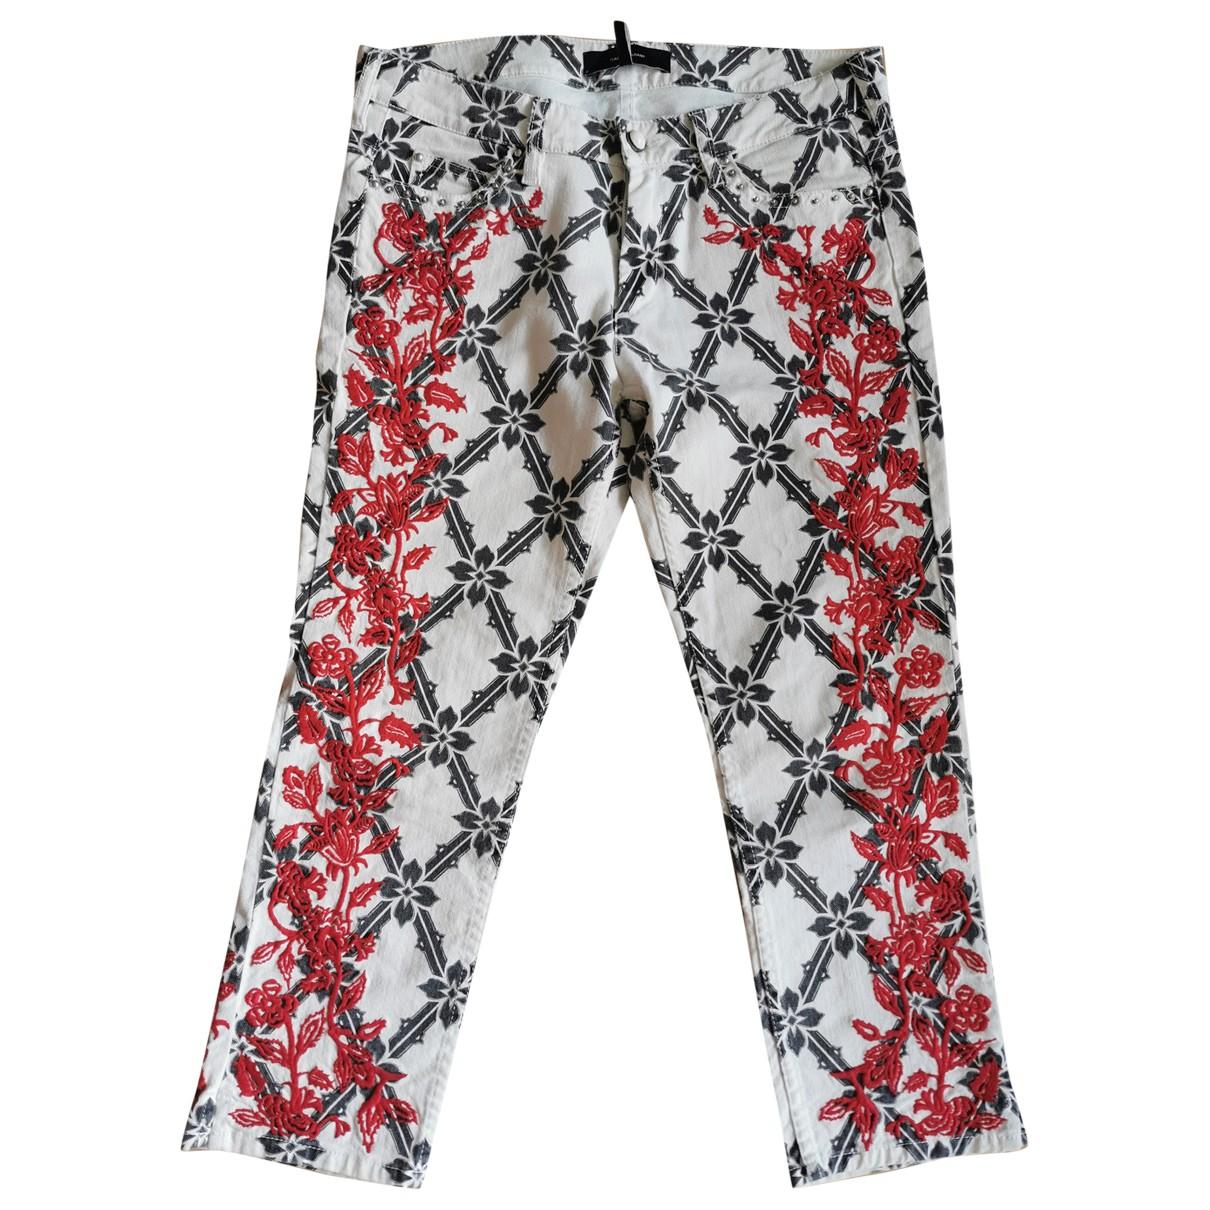 Isabel Marant \N Multicolour Denim - Jeans Trousers for Women 40 FR